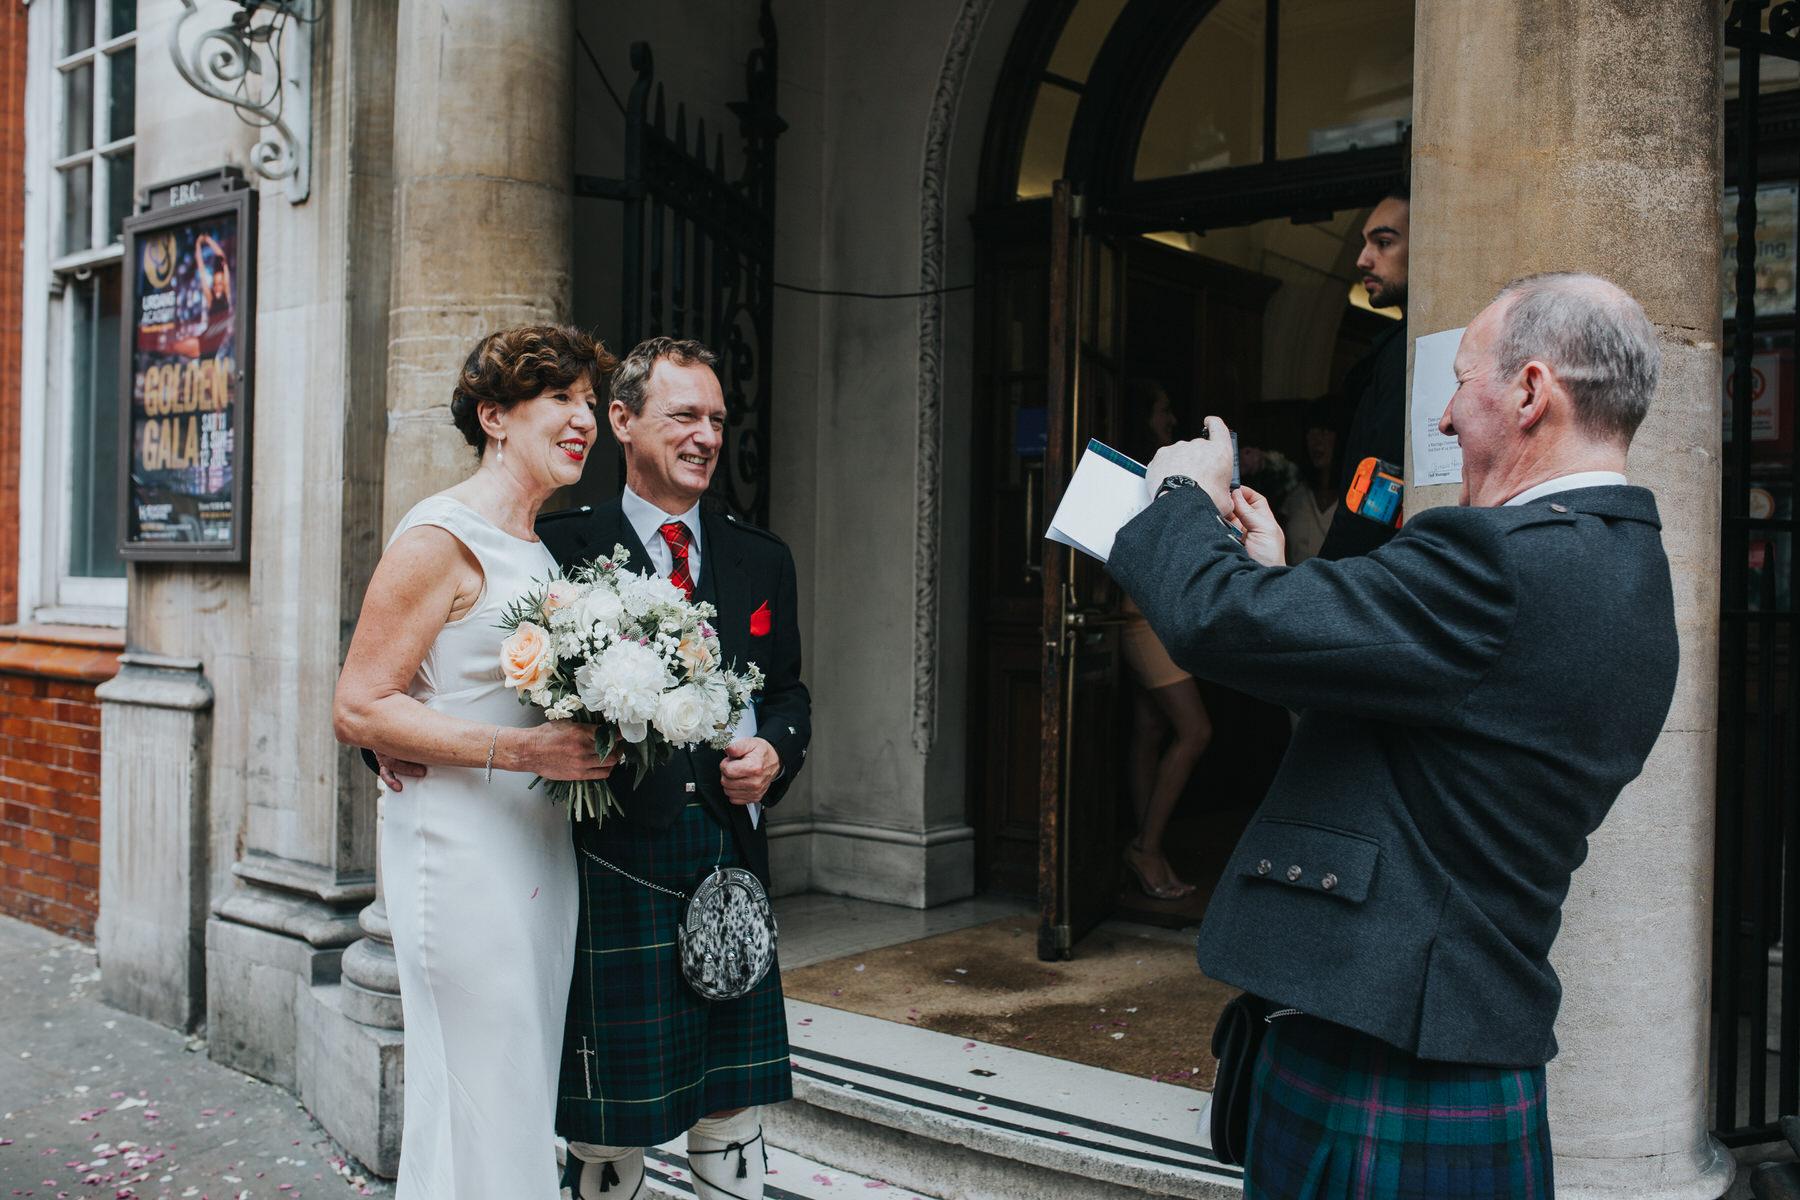 131 bride having photo taken reportage wedding photos.jpg